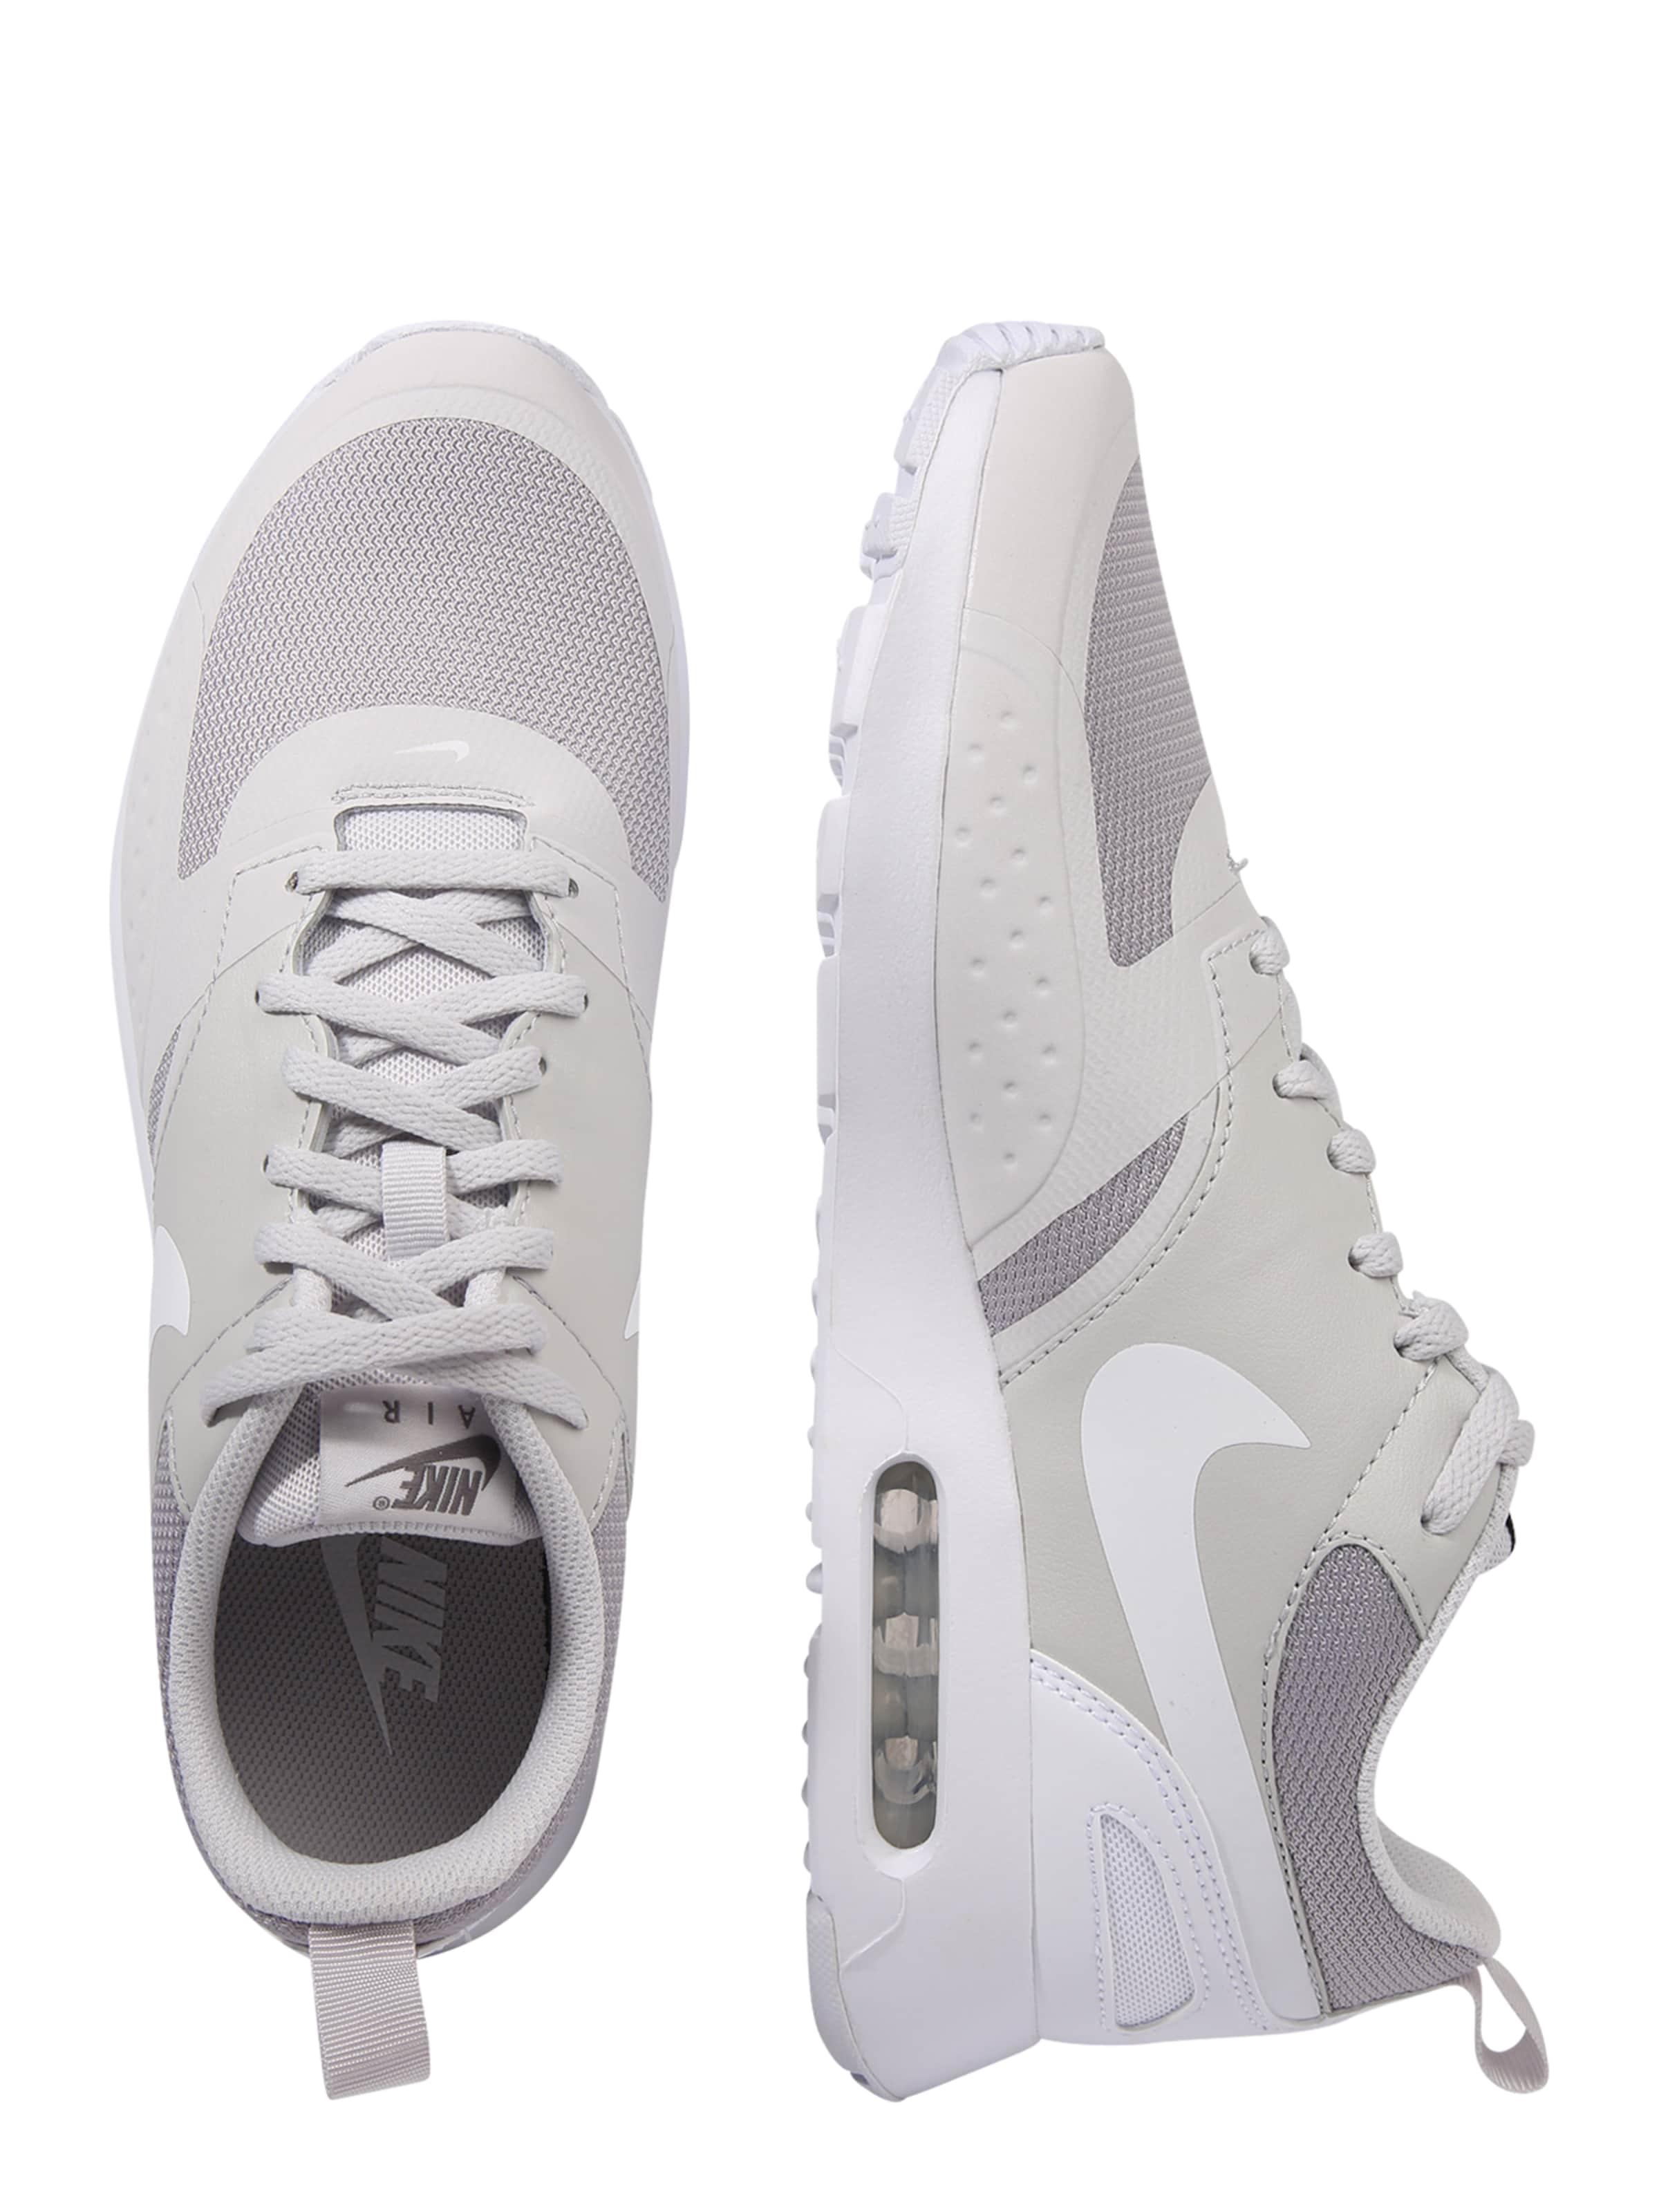 Nike Sportswear Turnschuhe 'AIR MAX VISION VISION VISION Synthetik, Textil Verkaufen Sie saisonale Aktionen 605301